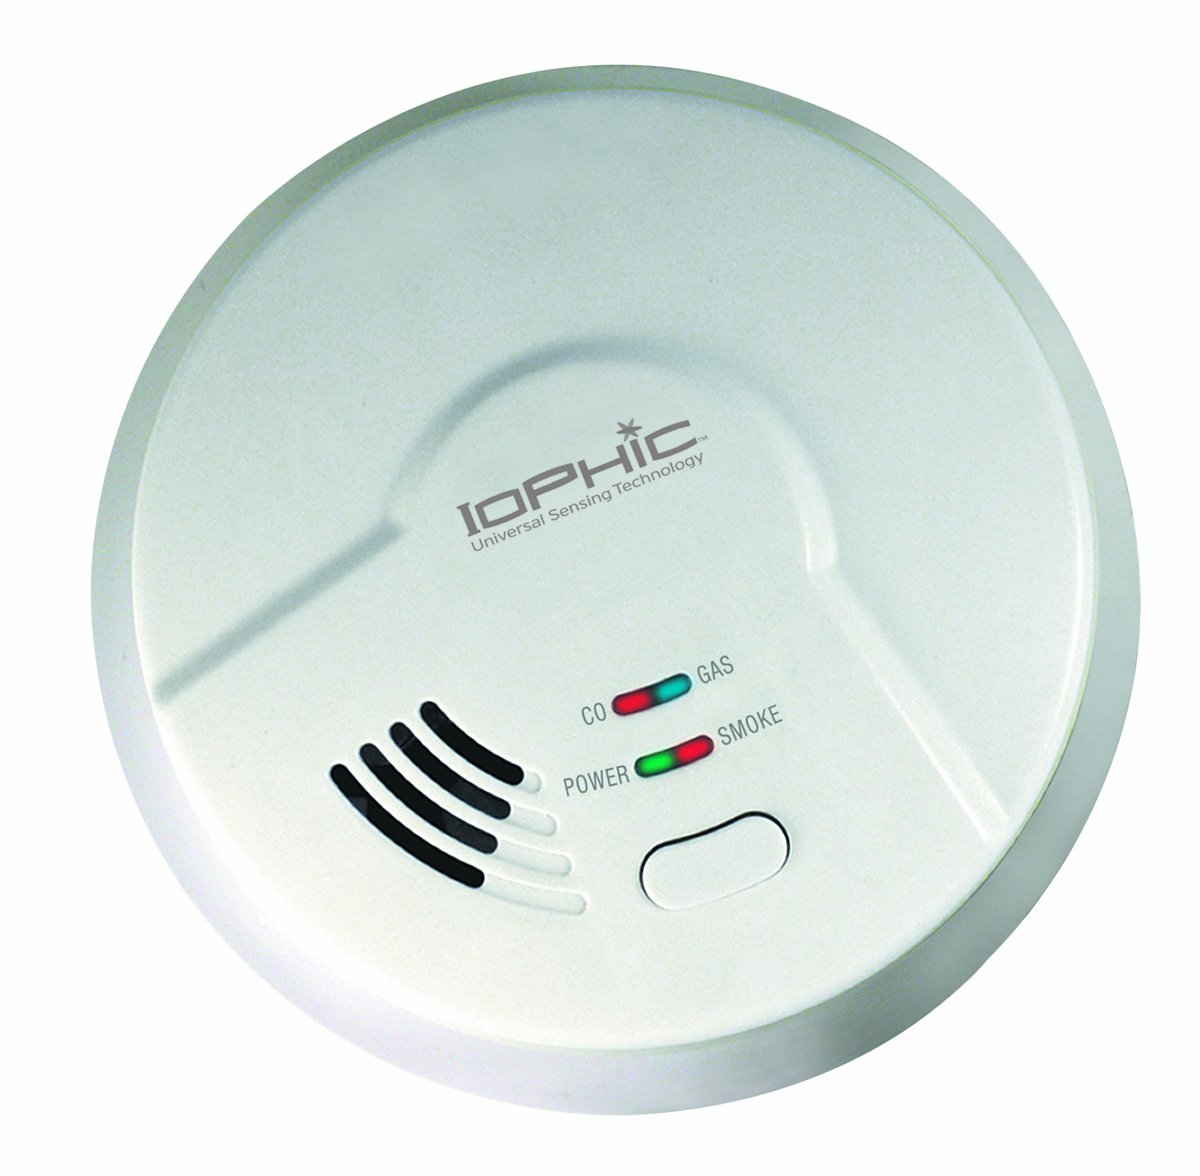 USI Electric MDSCN111 4-in-1 Universal Smoke Sensing Technology Hardwired  Smart Alarm - Combination Smoke Carbon Monoxide Detectors - Amazon.com